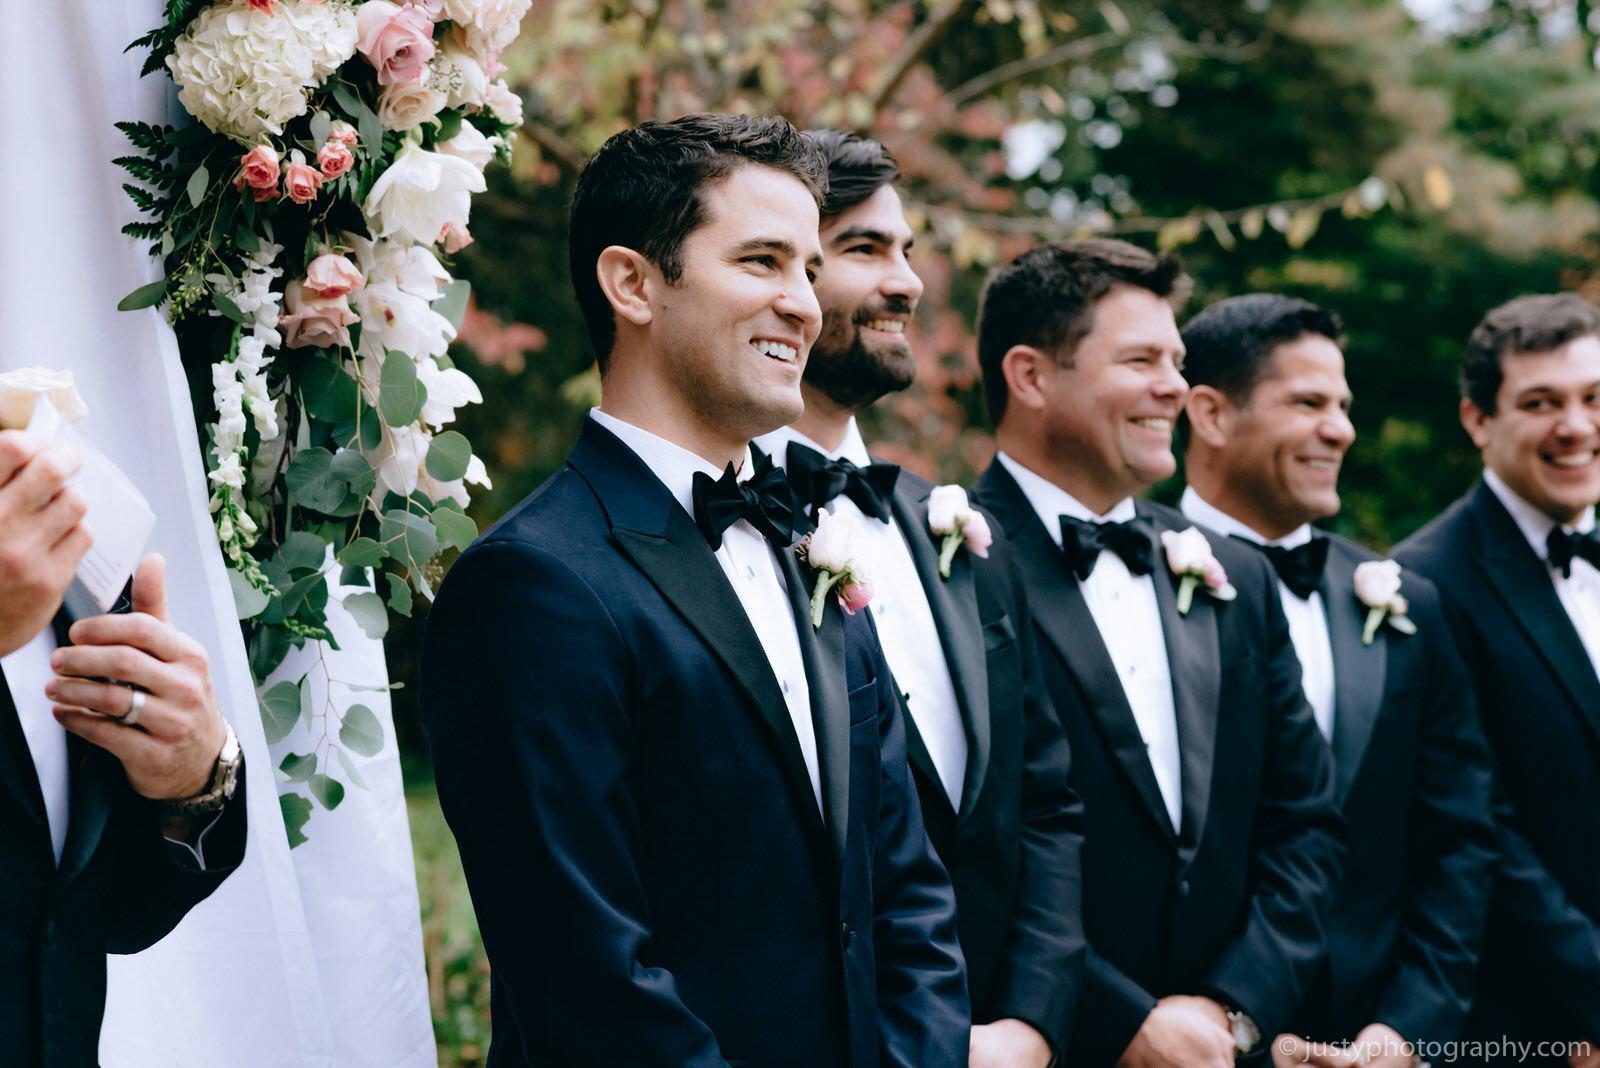 Omni Shoreham wedding photos-washington-dc-wedding-venues (113 of 171).jpg